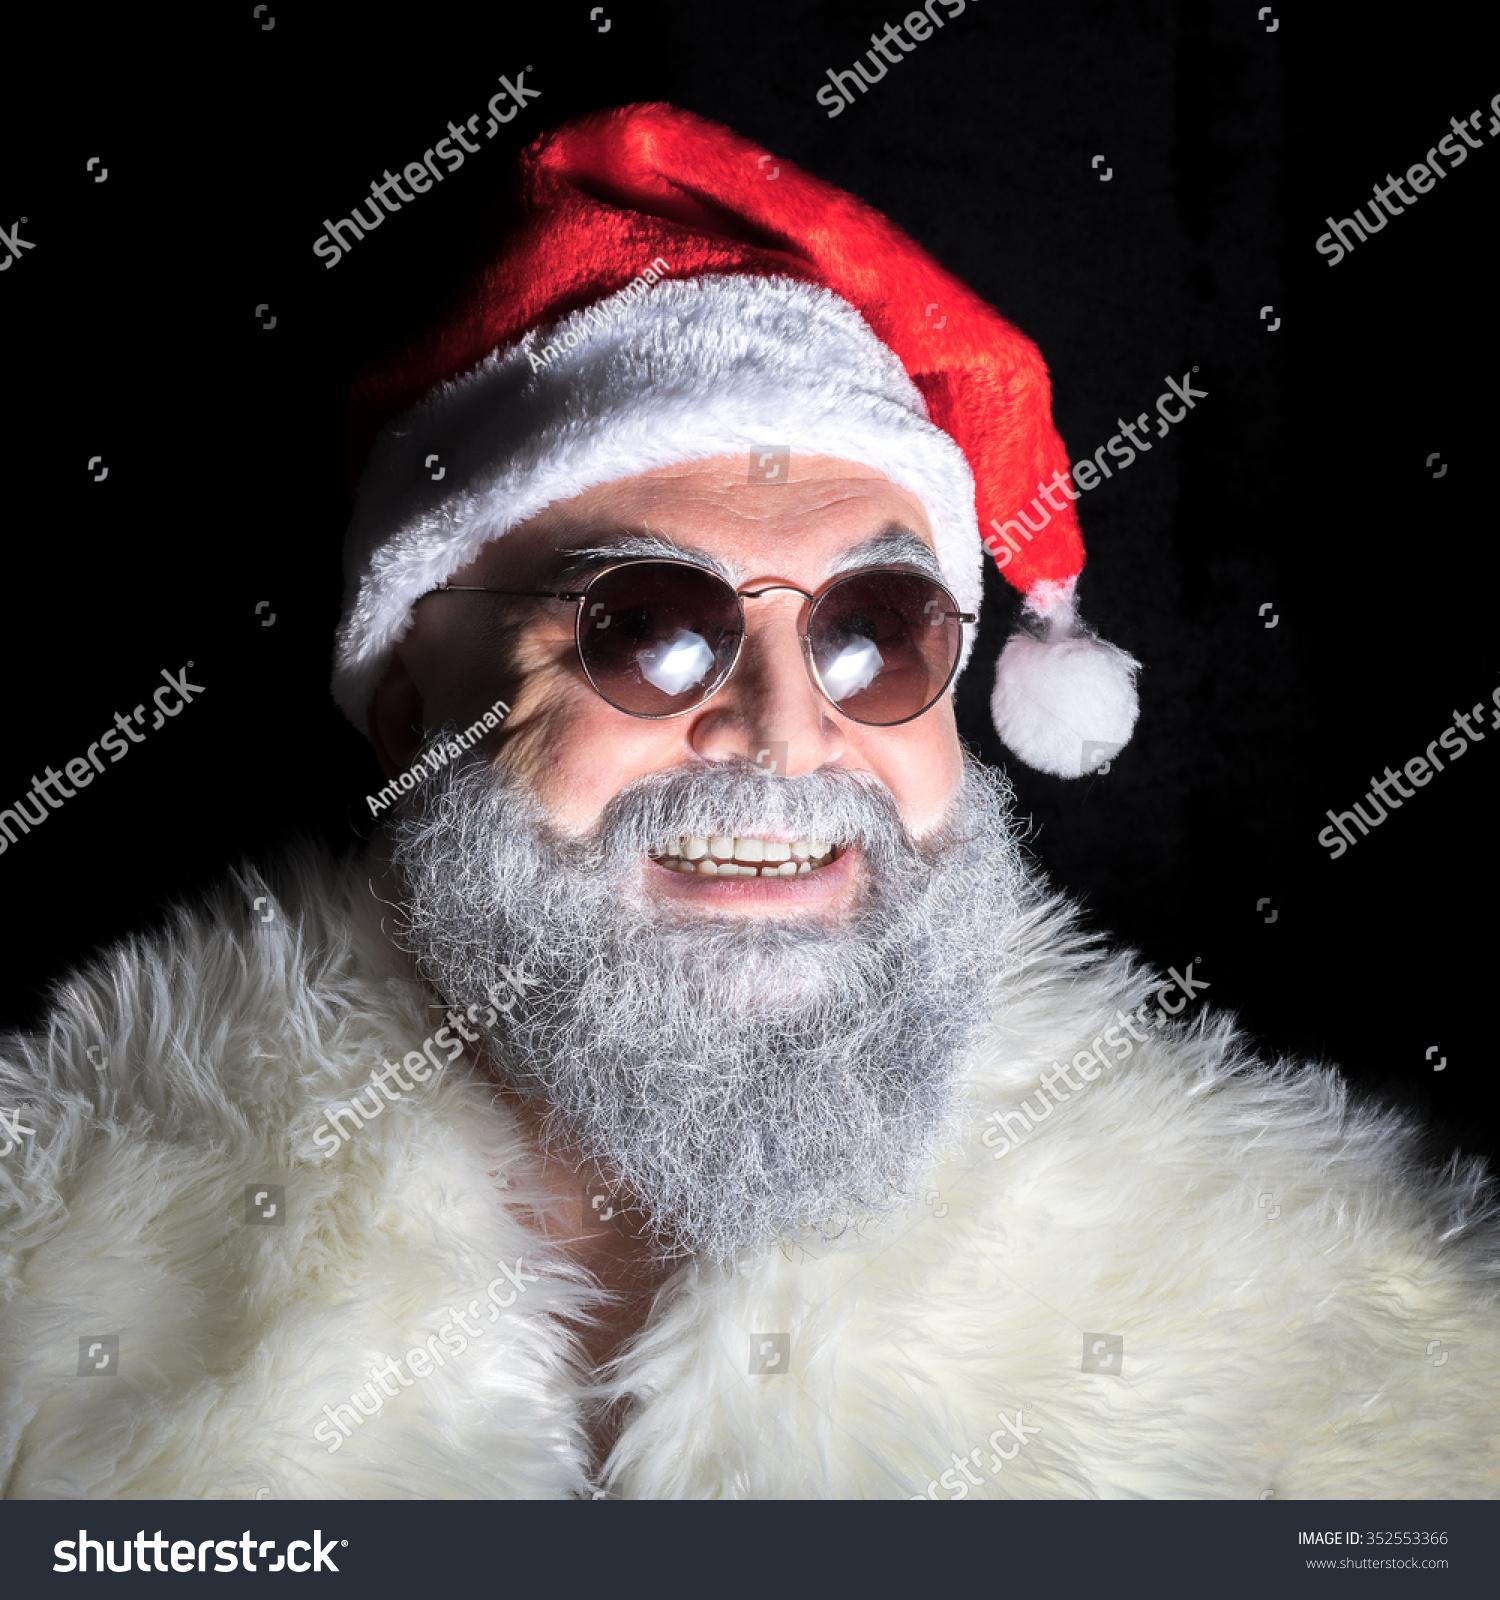 scary evil santa claus sunglasses stock photo 352553366 shutterstock